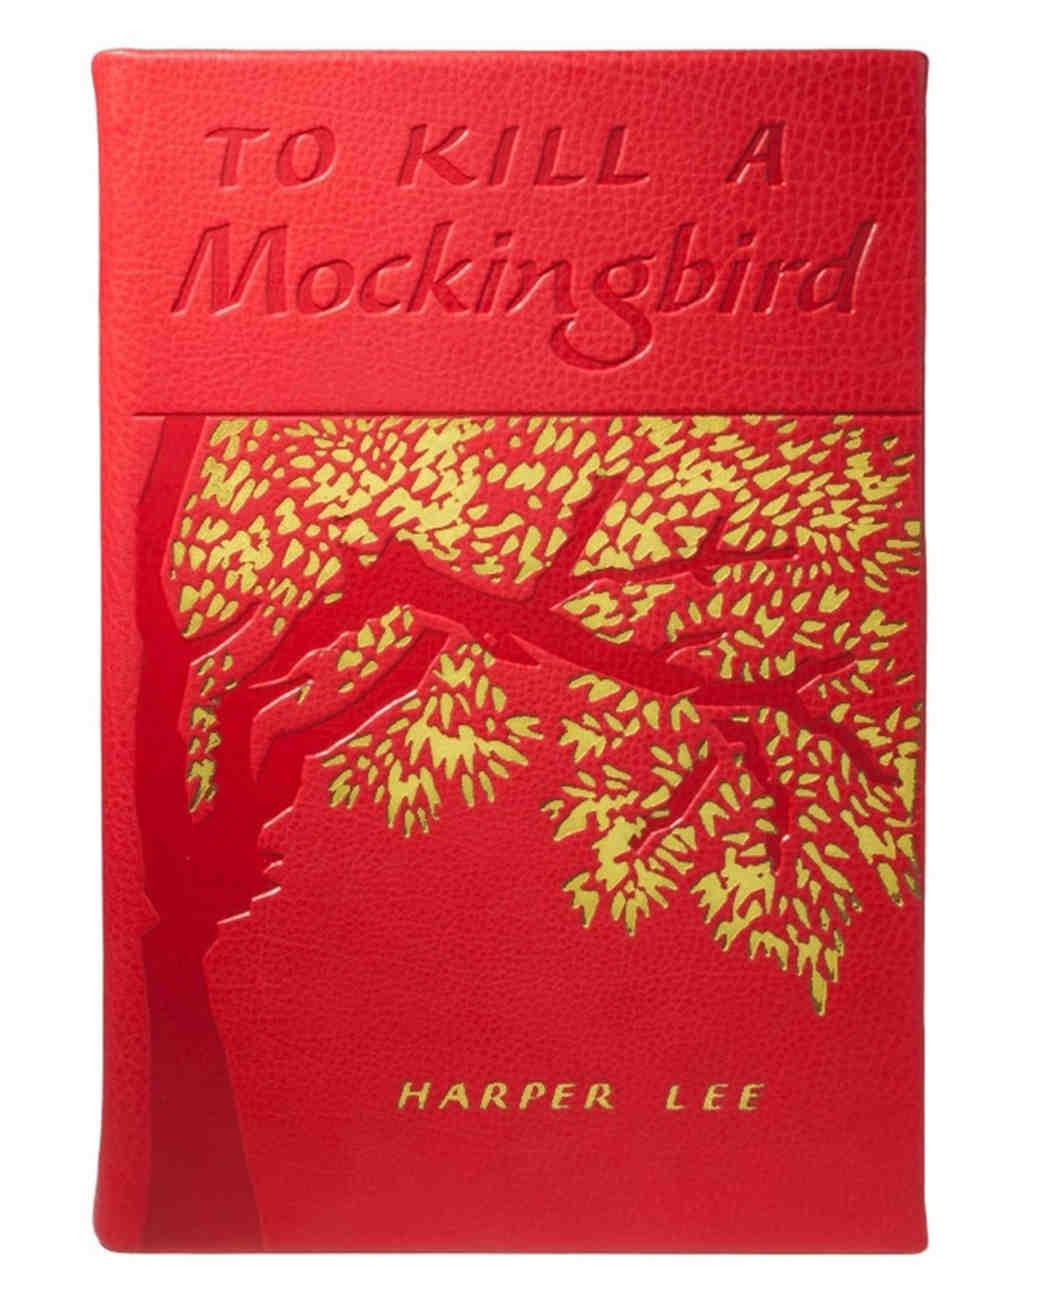 fathers-gift-guide-media-to-kill-a-mockingbird-0515.jpg